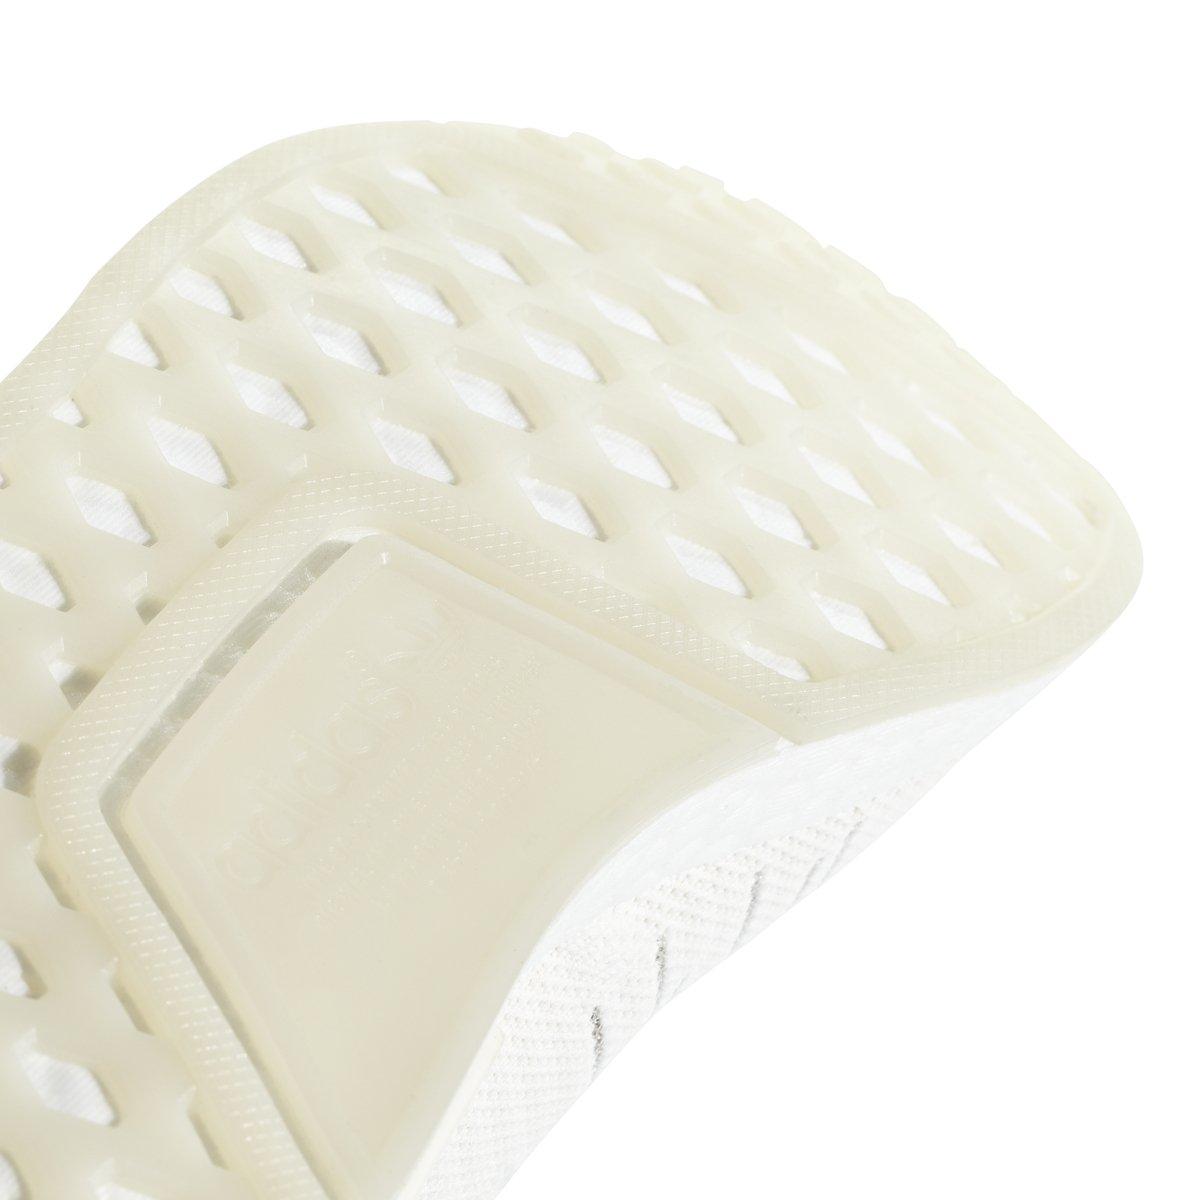 Adidas Originals Originals Originals Woherren NMD_R1 Cloud Weiß Cloud Weiß Clear Orange 6 B US f7d146